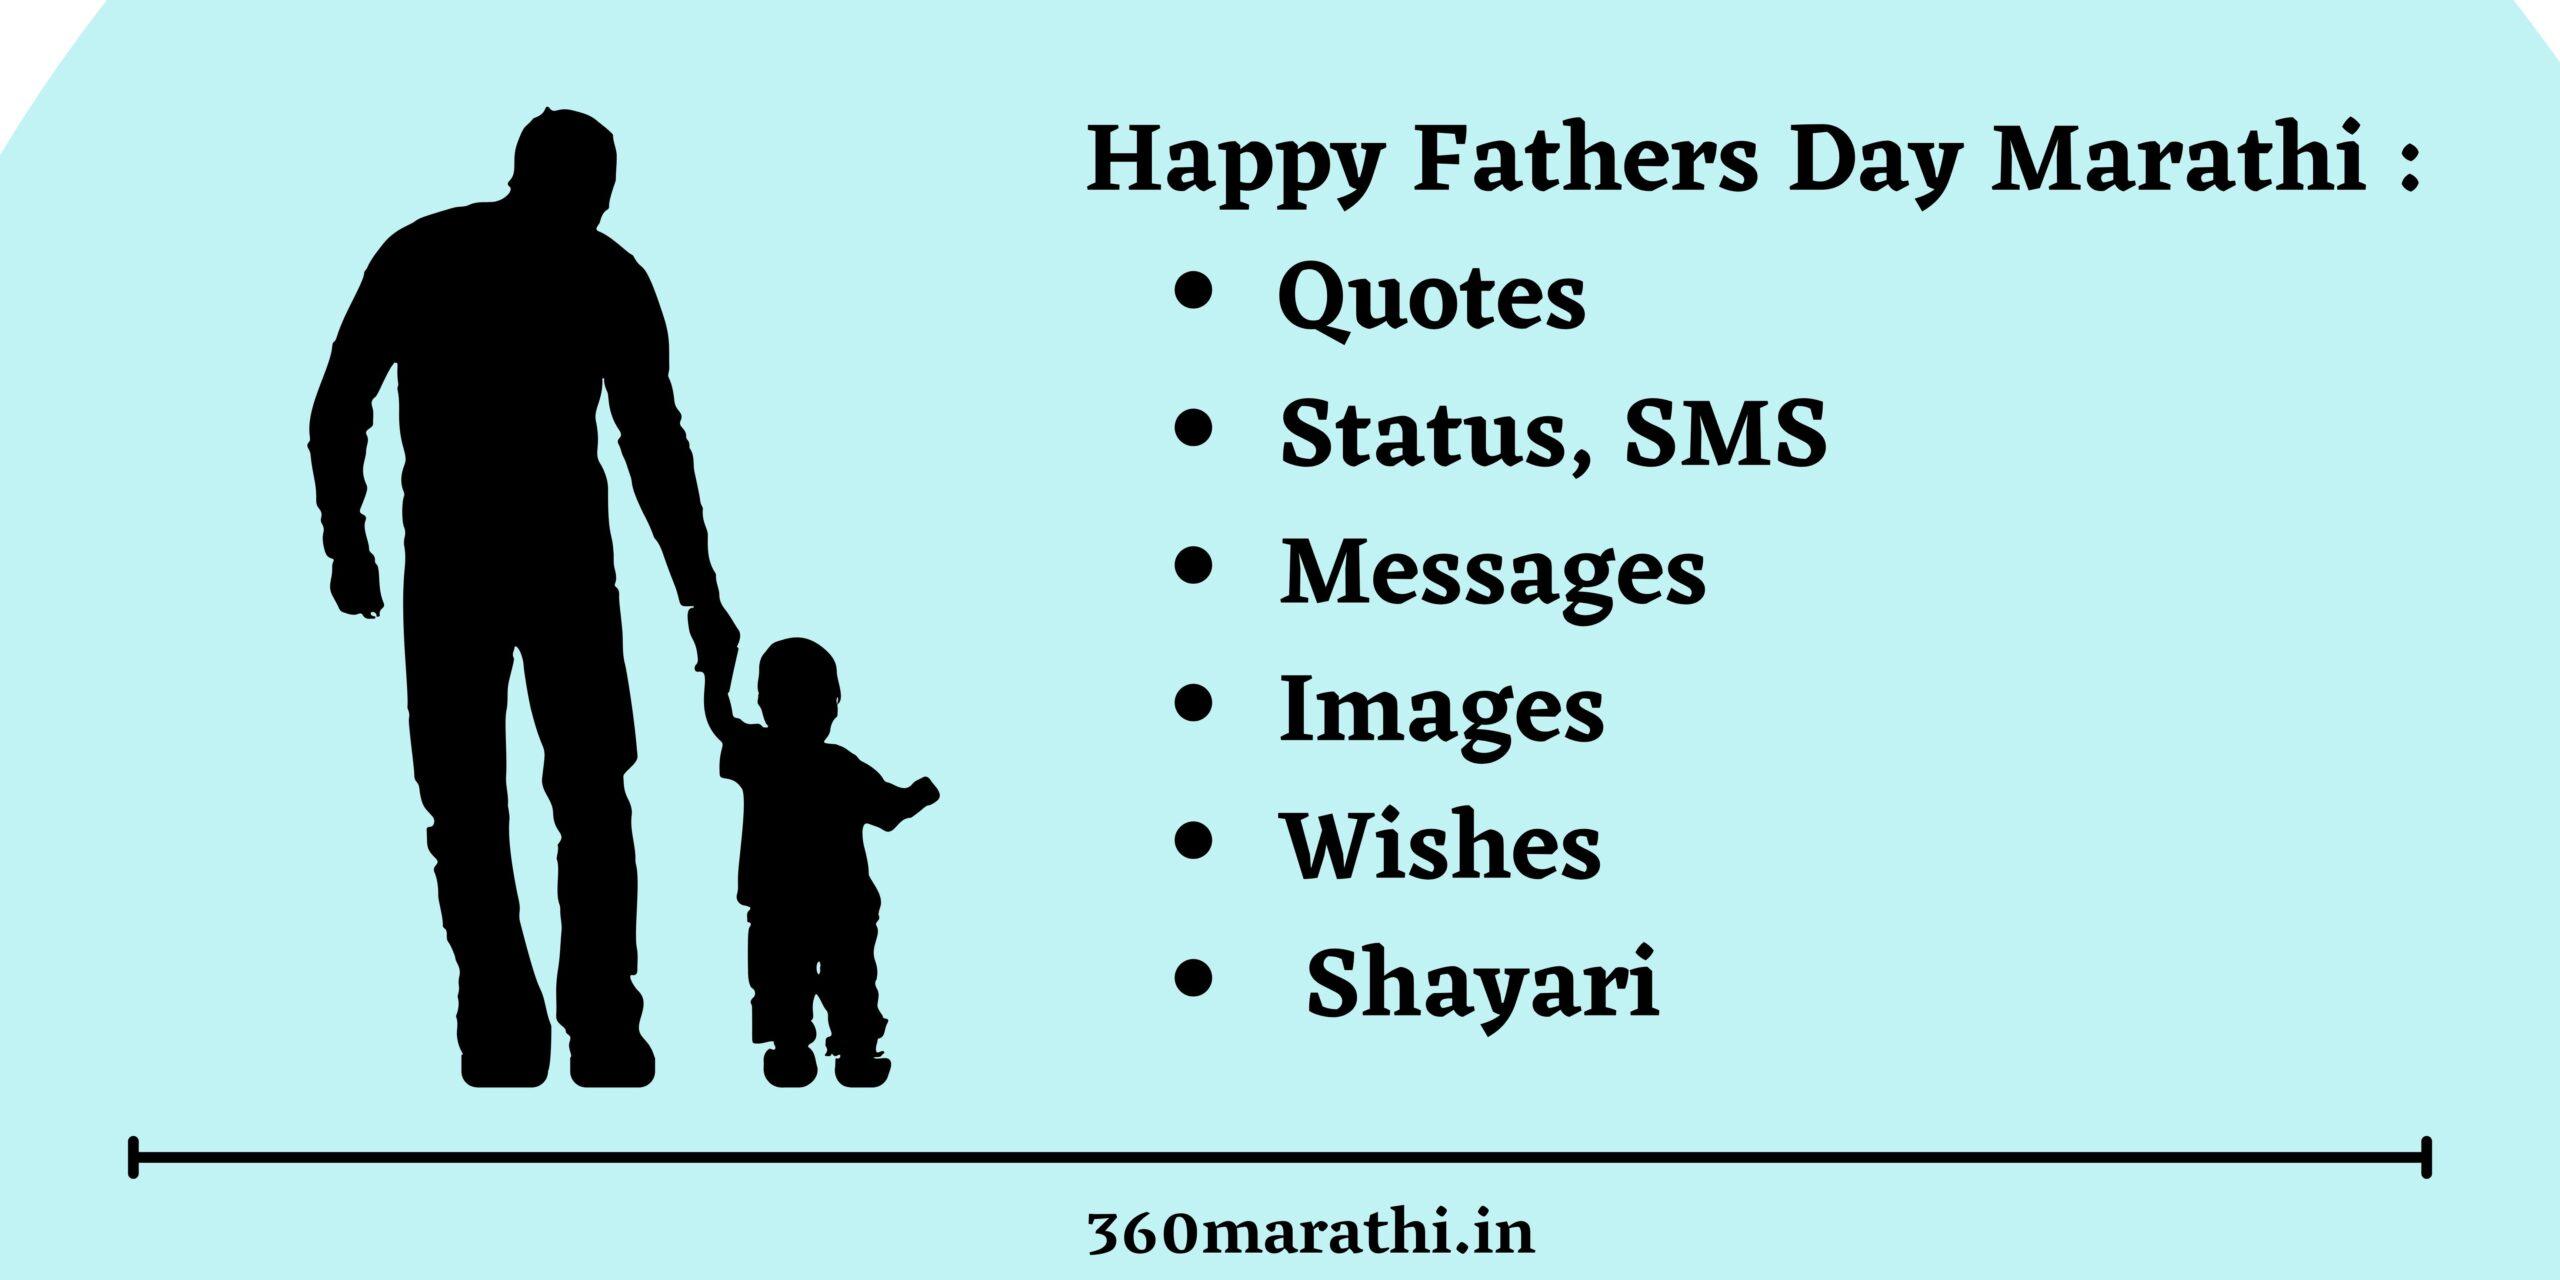 { 20 June 2021 } Fathers Day Marathi Quotes, Wishes Images, Messages, Greetings, Whatsapp Status | फादर्स डे साठी कोट्स आणि स्टेटस